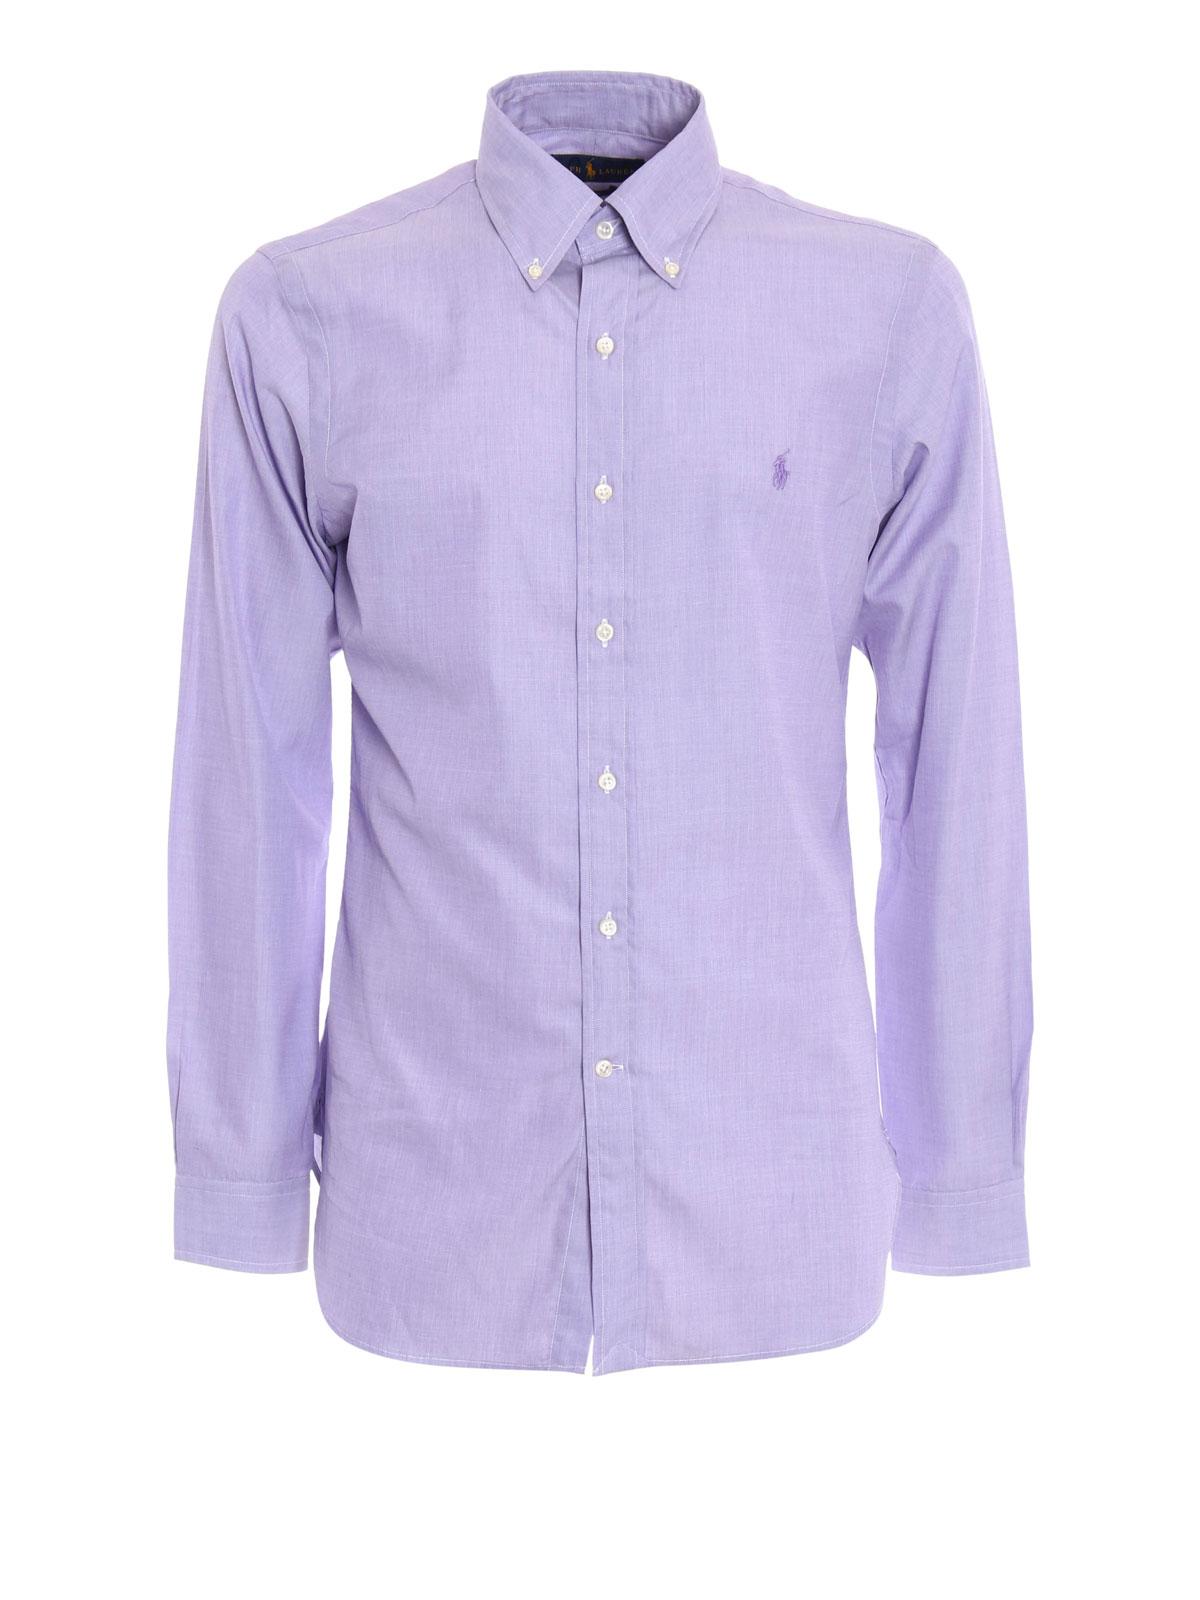 cotton slim fit shirt with logo by ralph lauren shirts. Black Bedroom Furniture Sets. Home Design Ideas